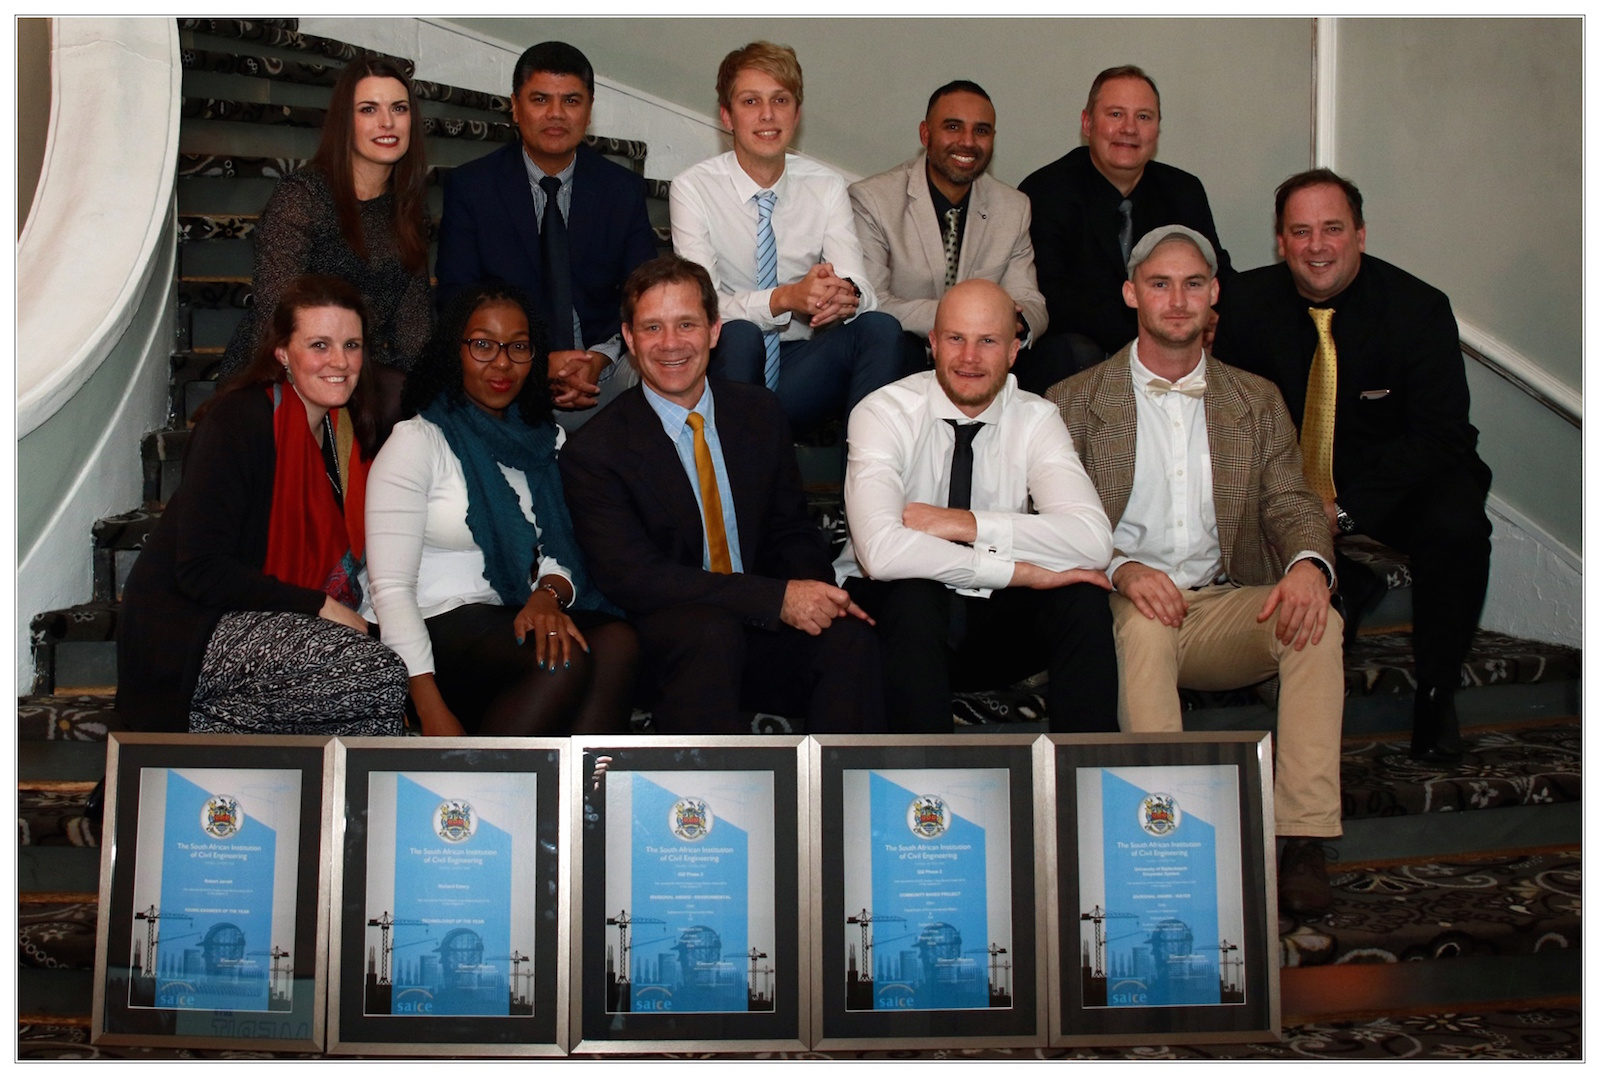 JG Afrika's winning team …. Back row: Terri-Ann Kruger, Owen Davis , Byron Mawer, Fareed Ismail and Wimpie Krügel. Front row: Viola Milner, Zama Mdlalose, Richard Emery, Bobby Jarratt, Benjamin Biggs, Andrew Clothier.